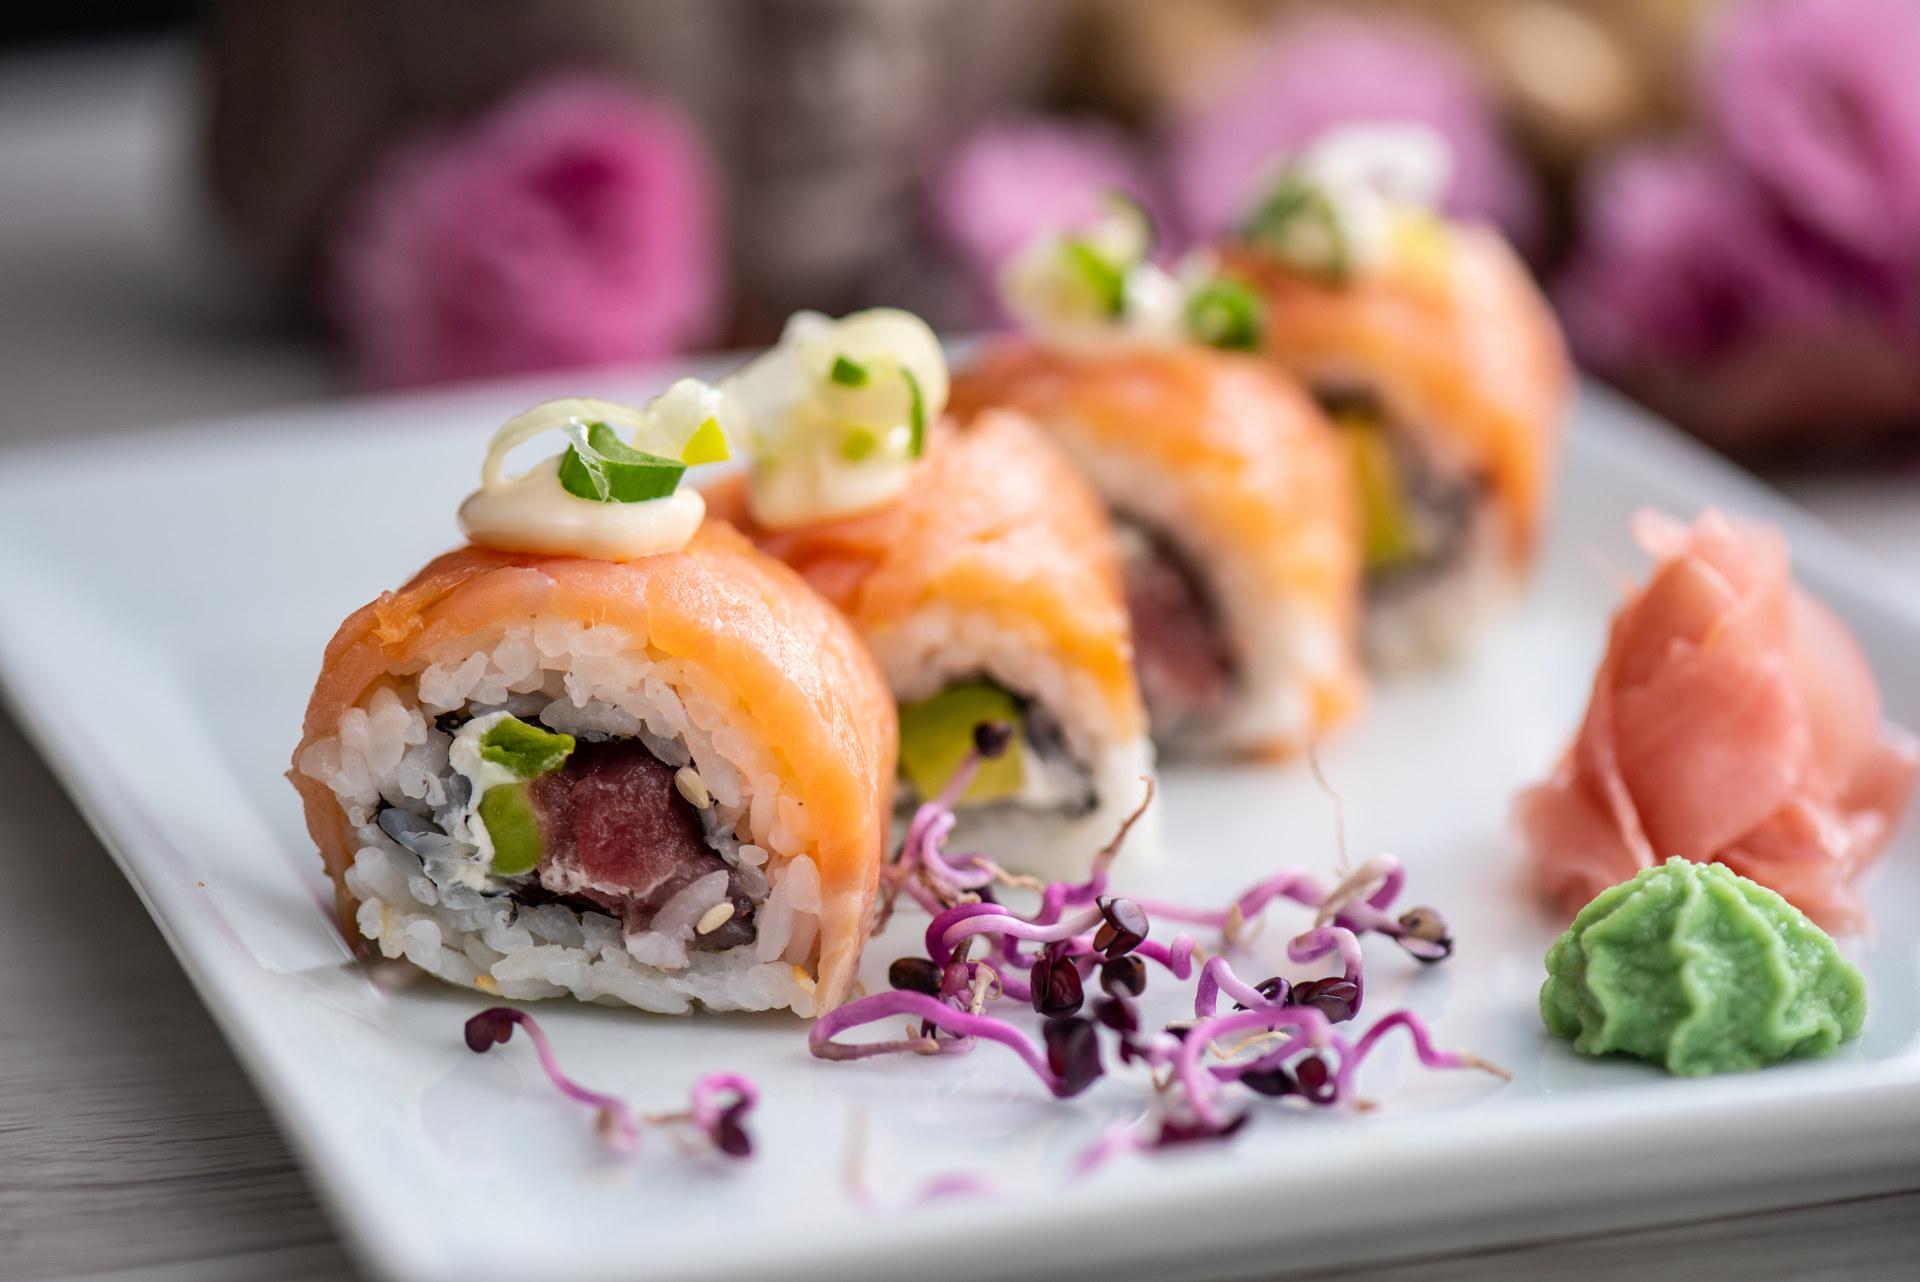 sushi tekercsek lazaccal